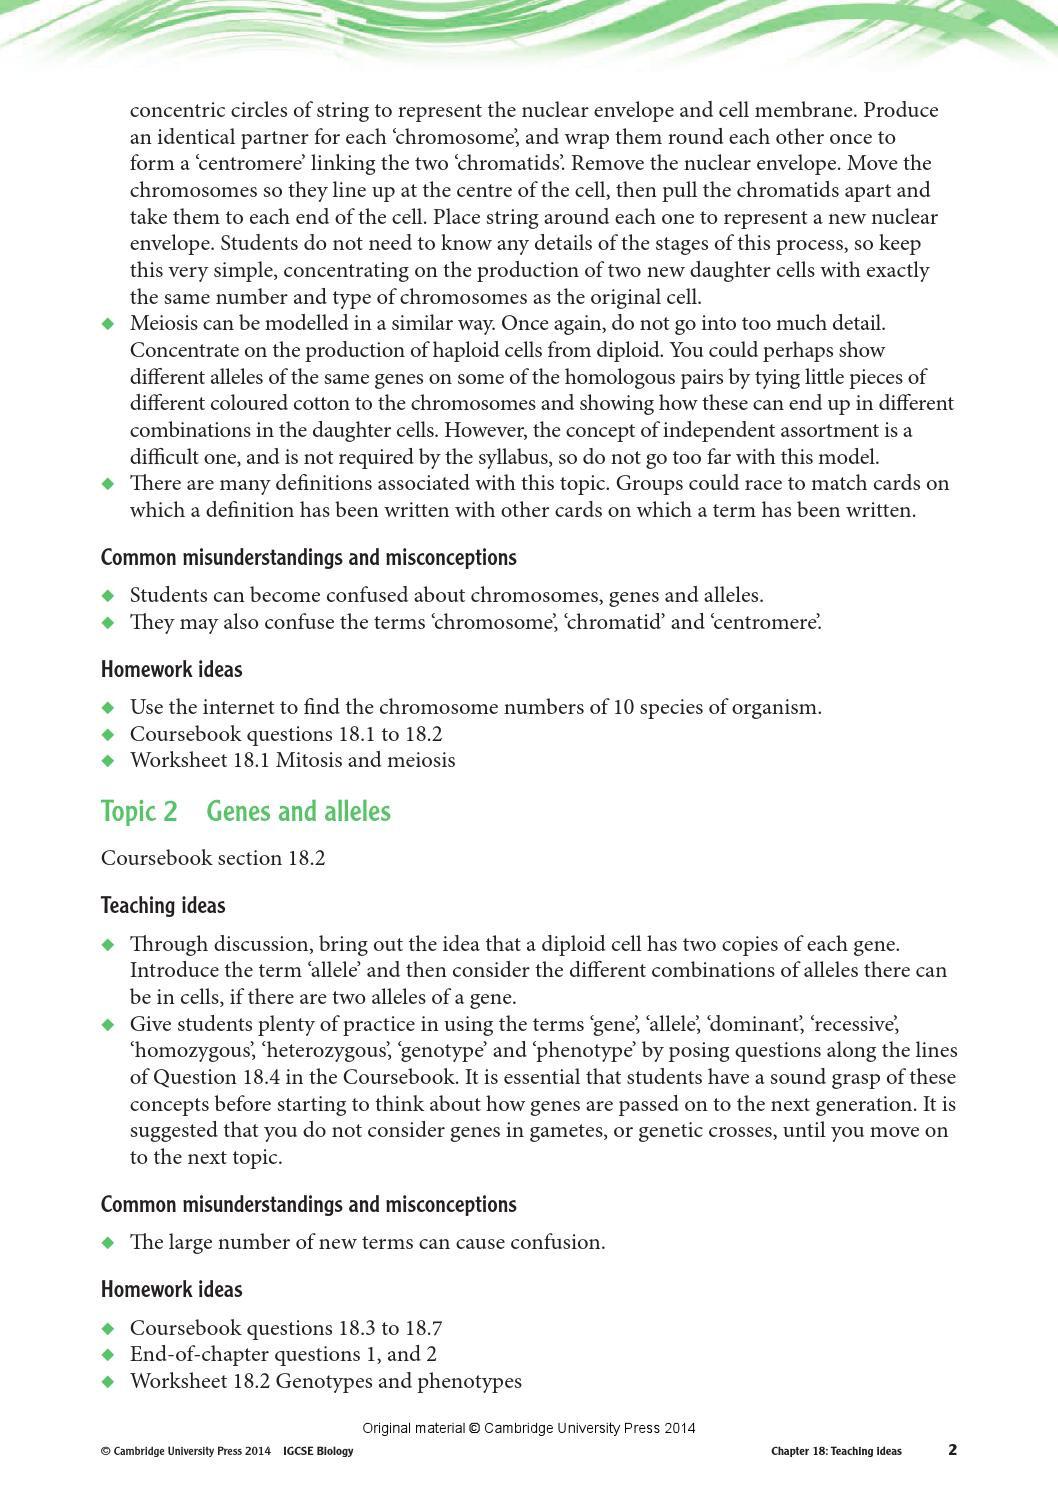 Genotypes and Phenotypes Worksheet Answers Cambridge Igcse Biology Teacher S Resource Third Edition